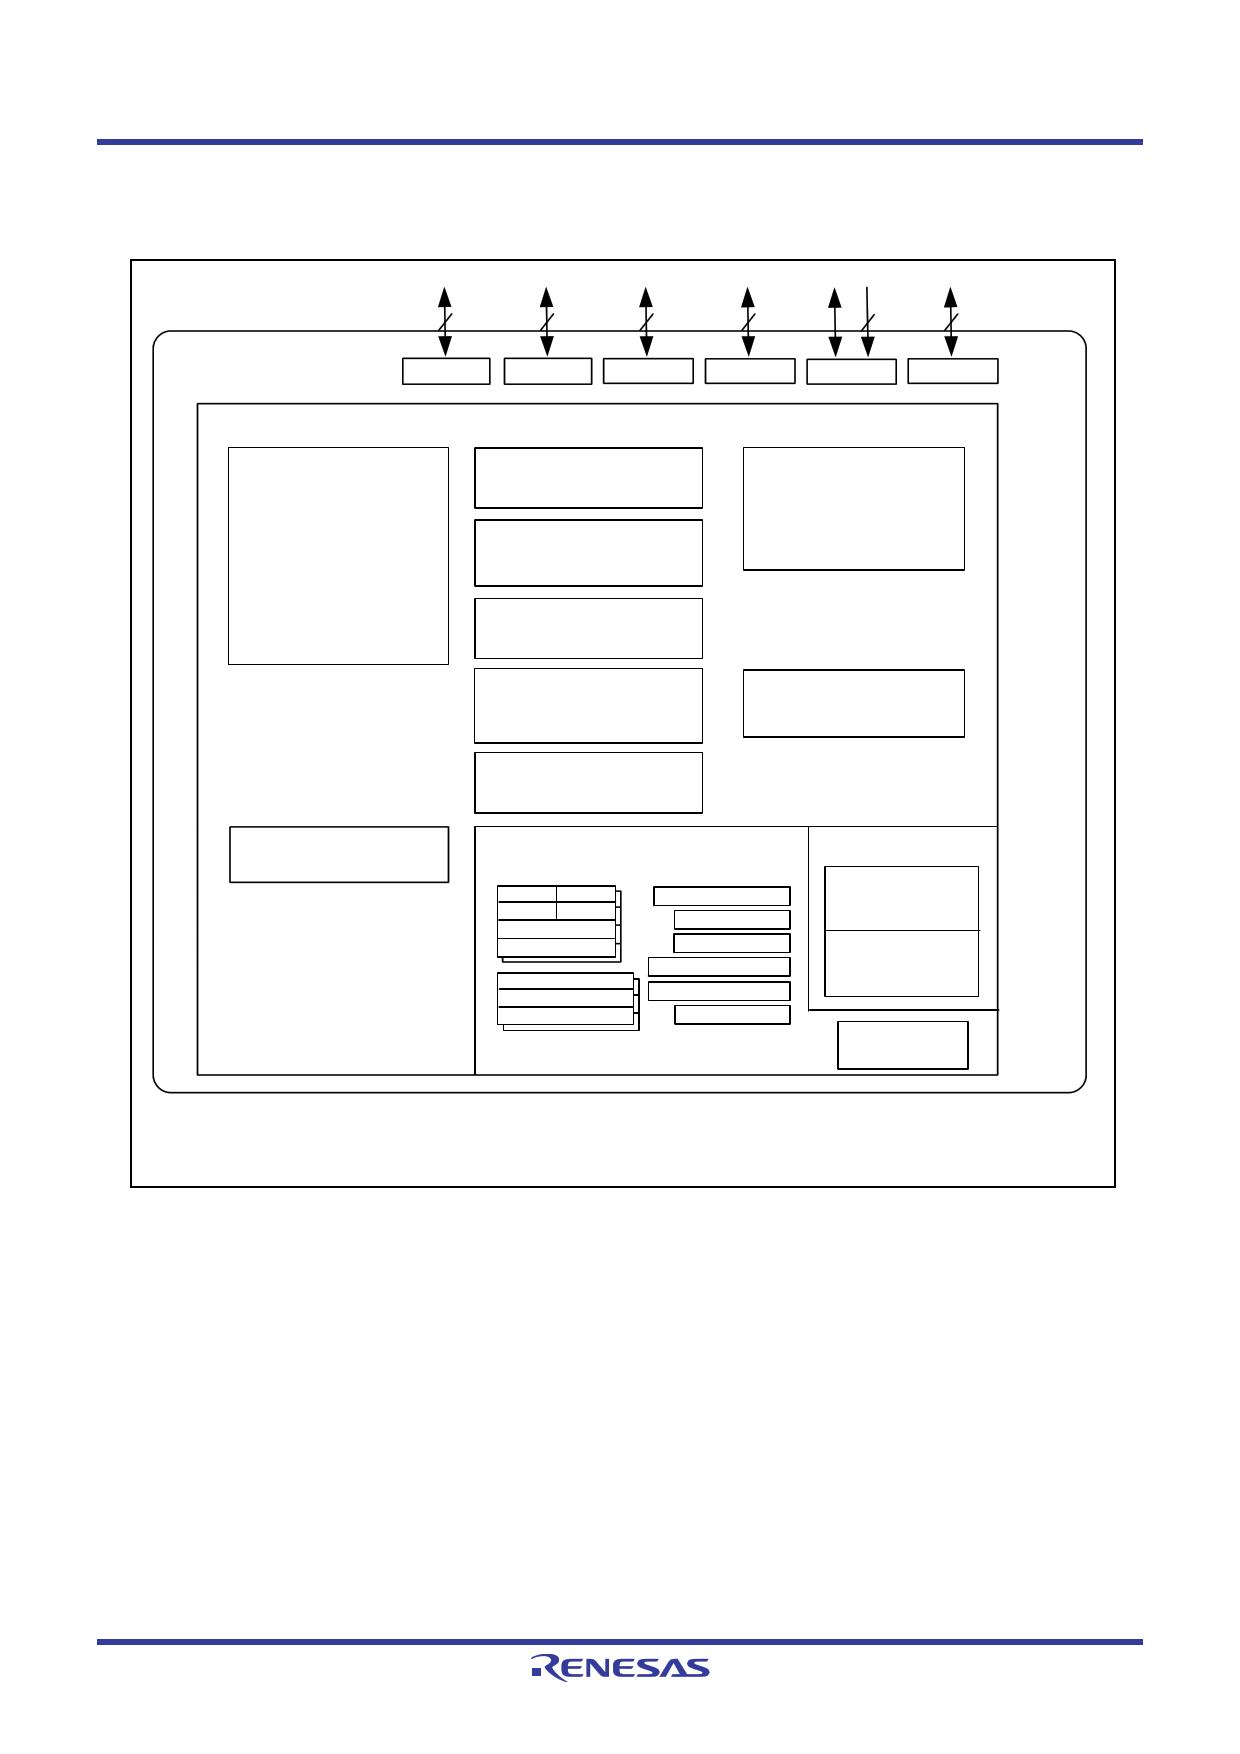 R5F21236JFP pdf, 반도체, 판매, 대치품